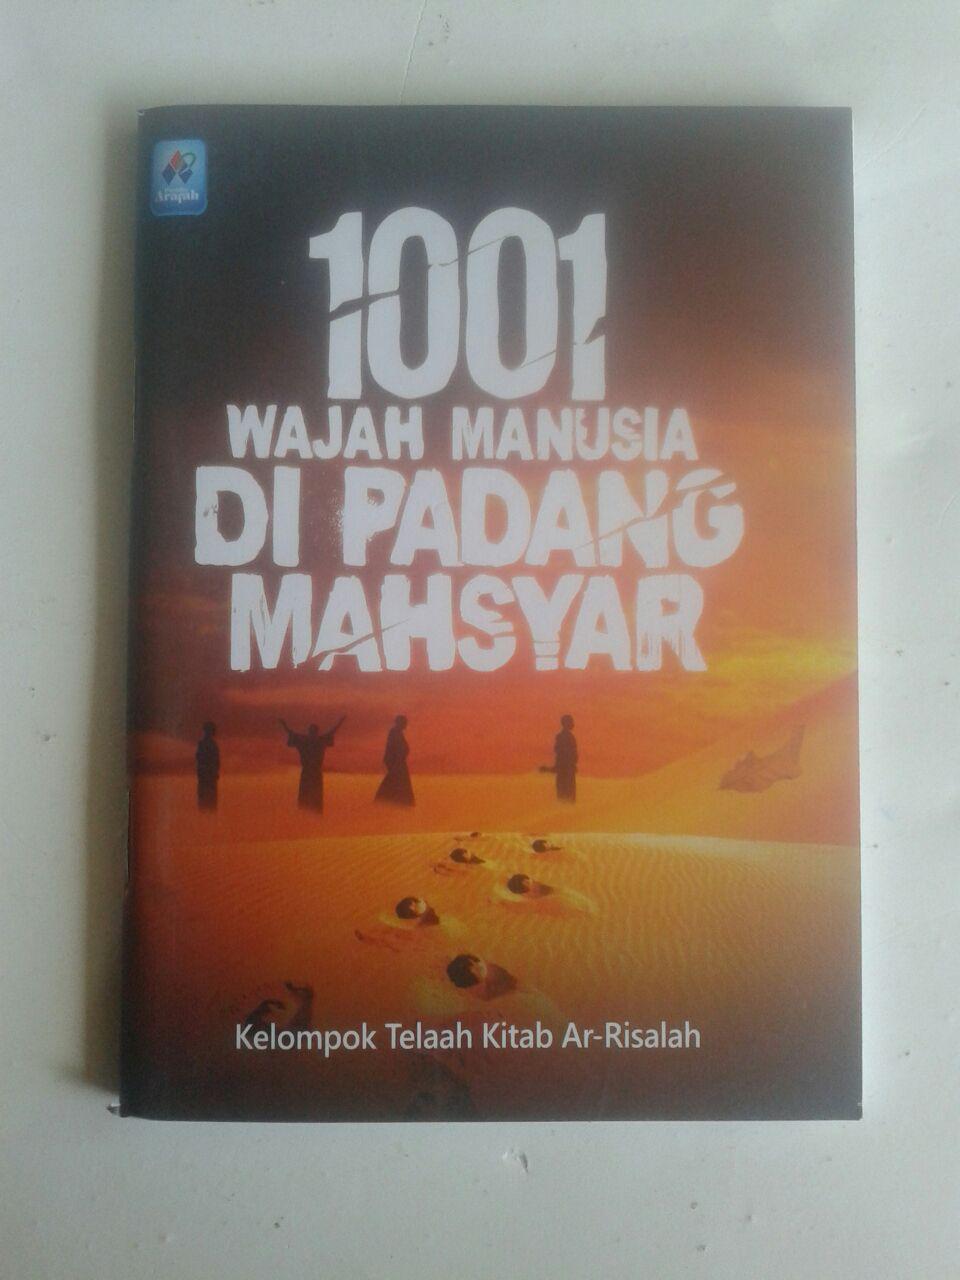 Buku Saku 1001 Wajah Manusia Di Padang Mahsyar cover 2